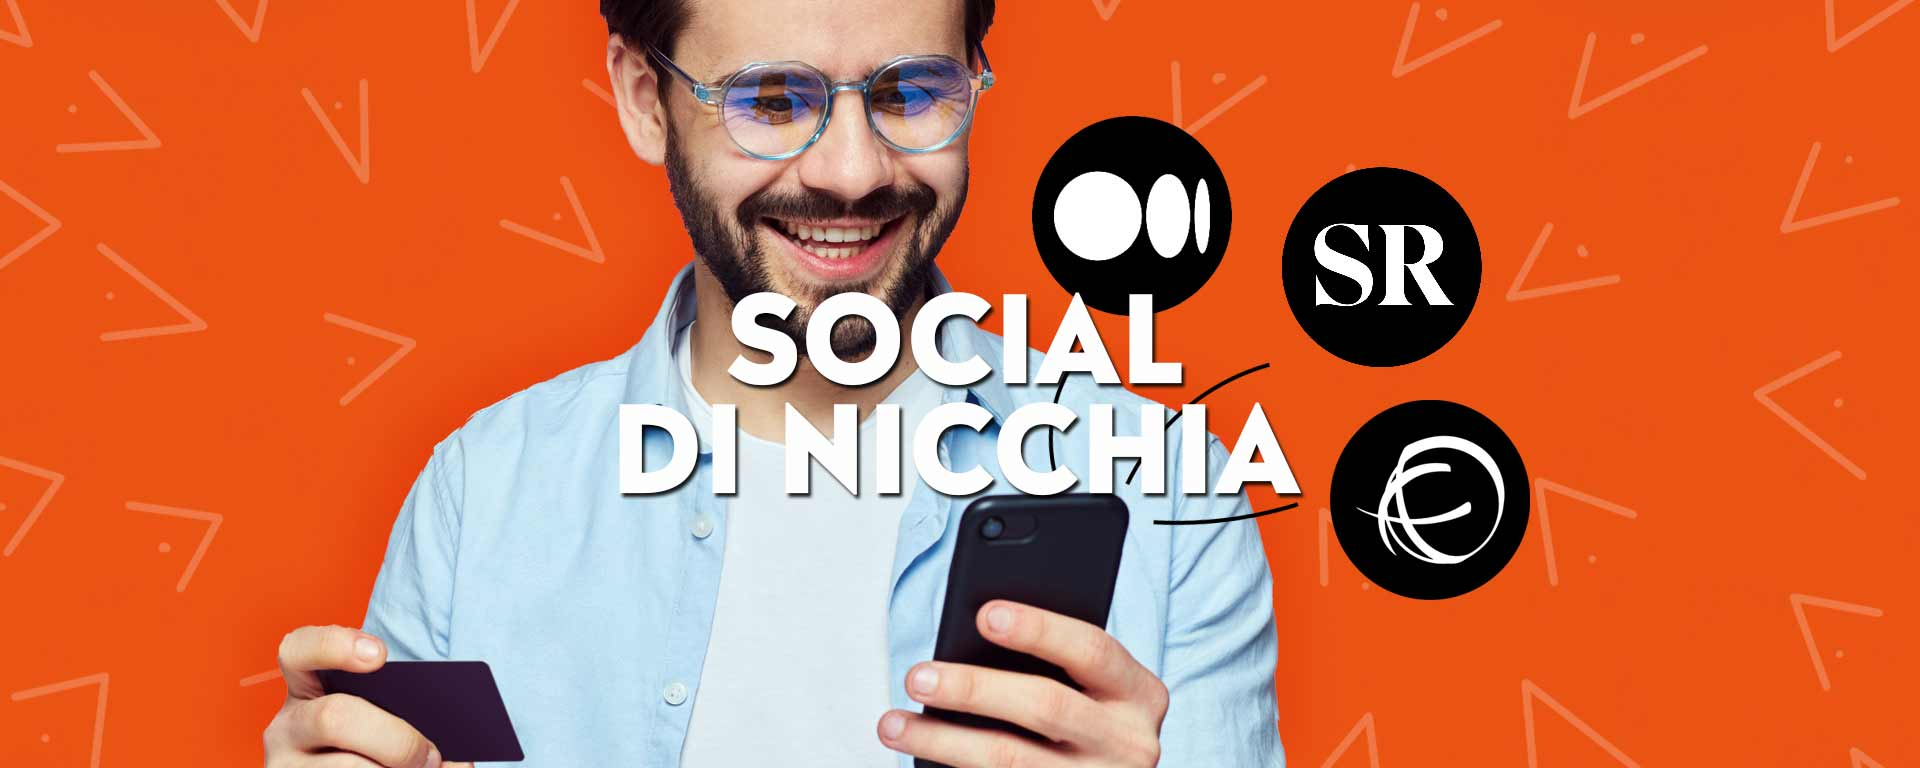 social-nicchia-iaa